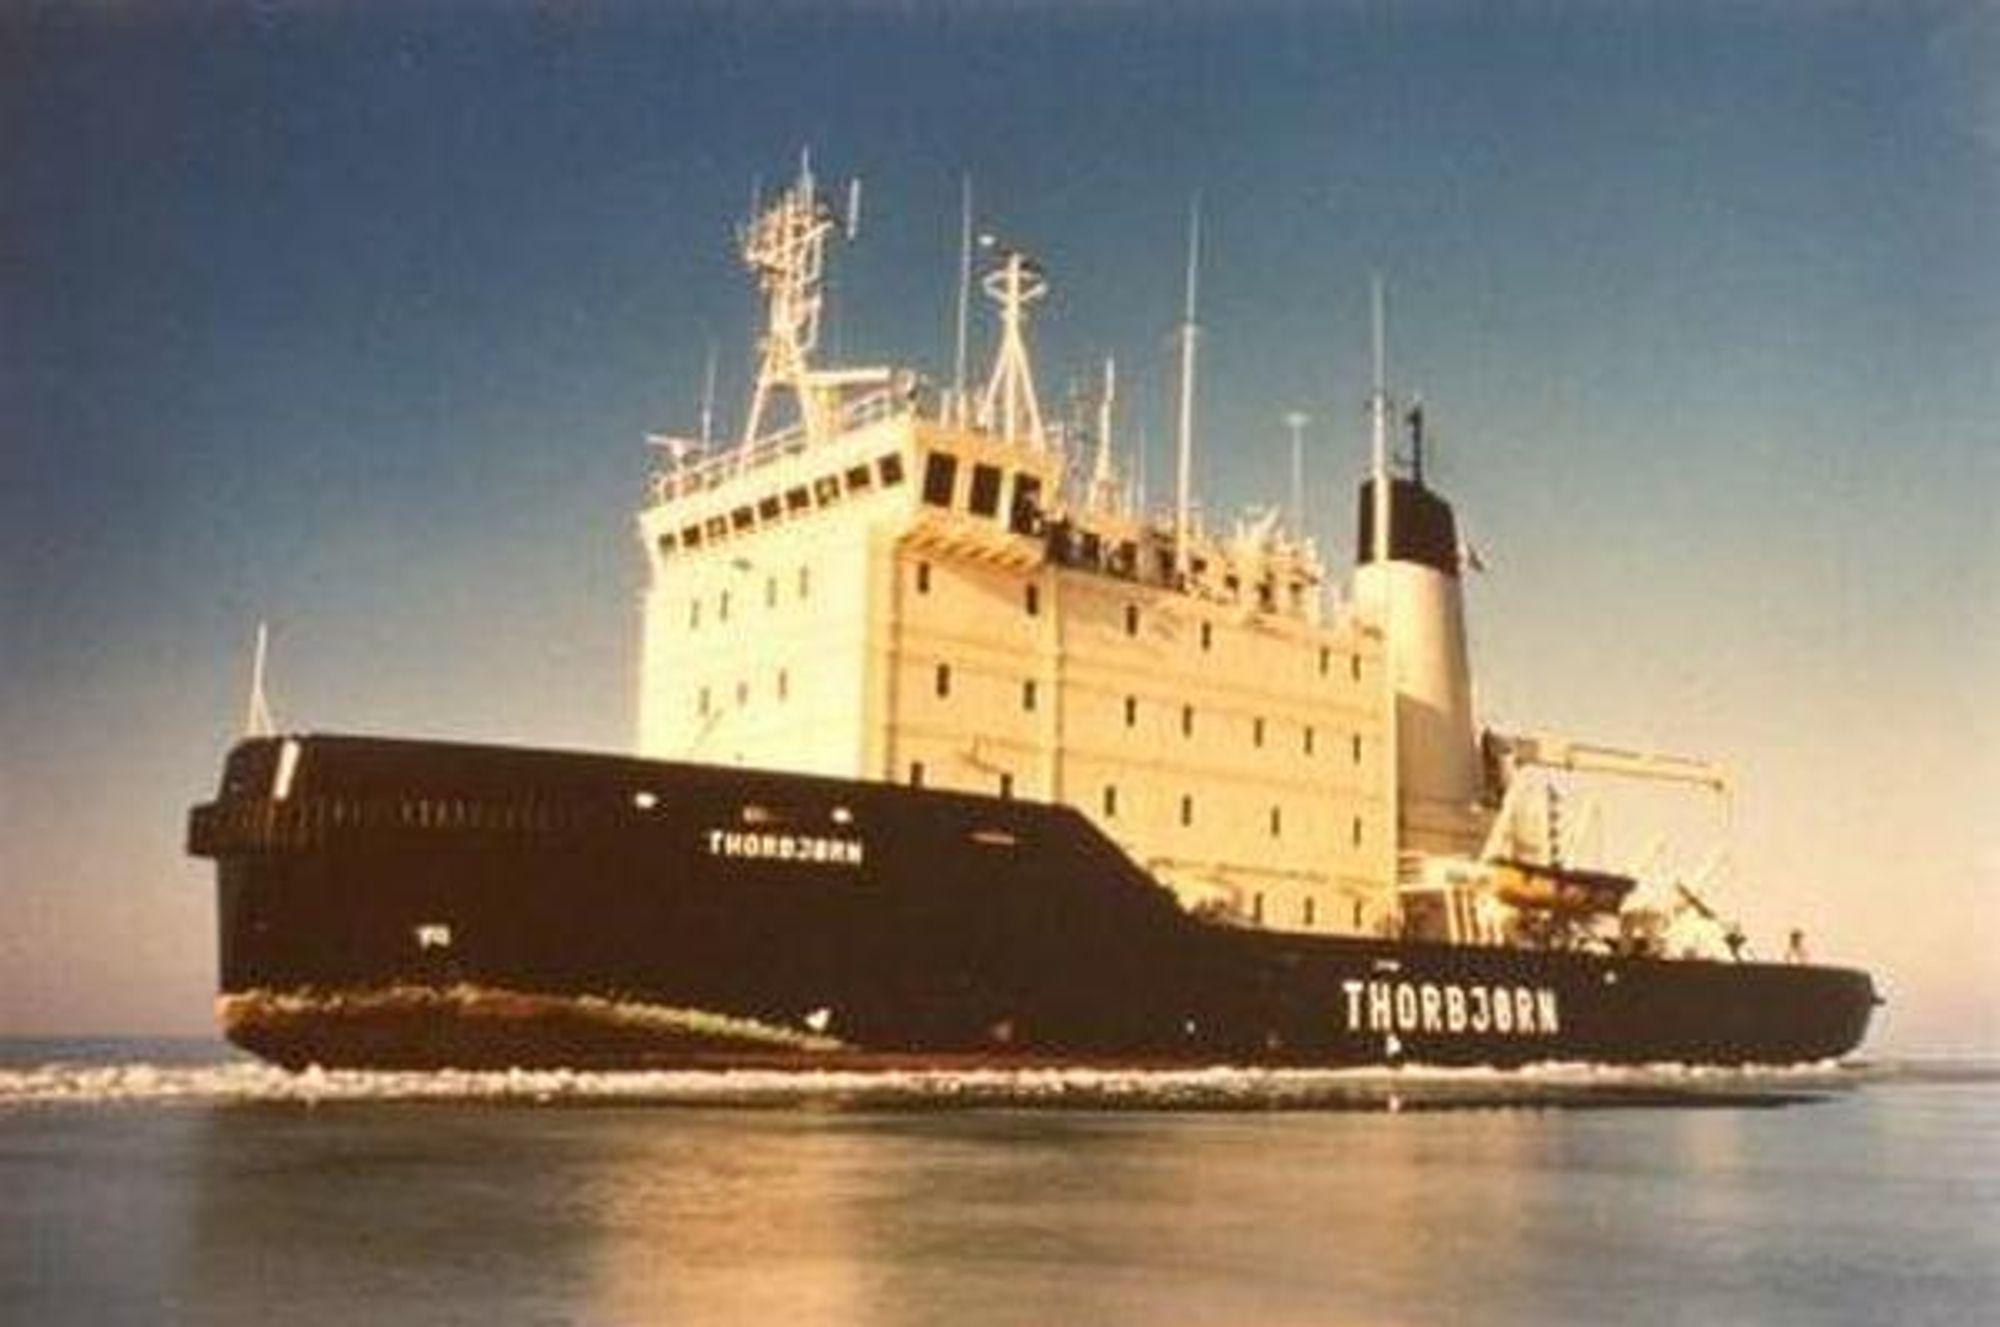 Thorbjørn, dansk isbryter. Thorbjørn ble ferdigstilt ved Svendborg Værft i 1981 og er både sjøoppmålingsskip og isbryter. To hovedmotorer driver to propeller. Den holder 16 knop og kan takle 1,5 meter tykk is. Thorbjørn er 67 meter lang og 15 meter bred. Besetningen er på 24 personer.